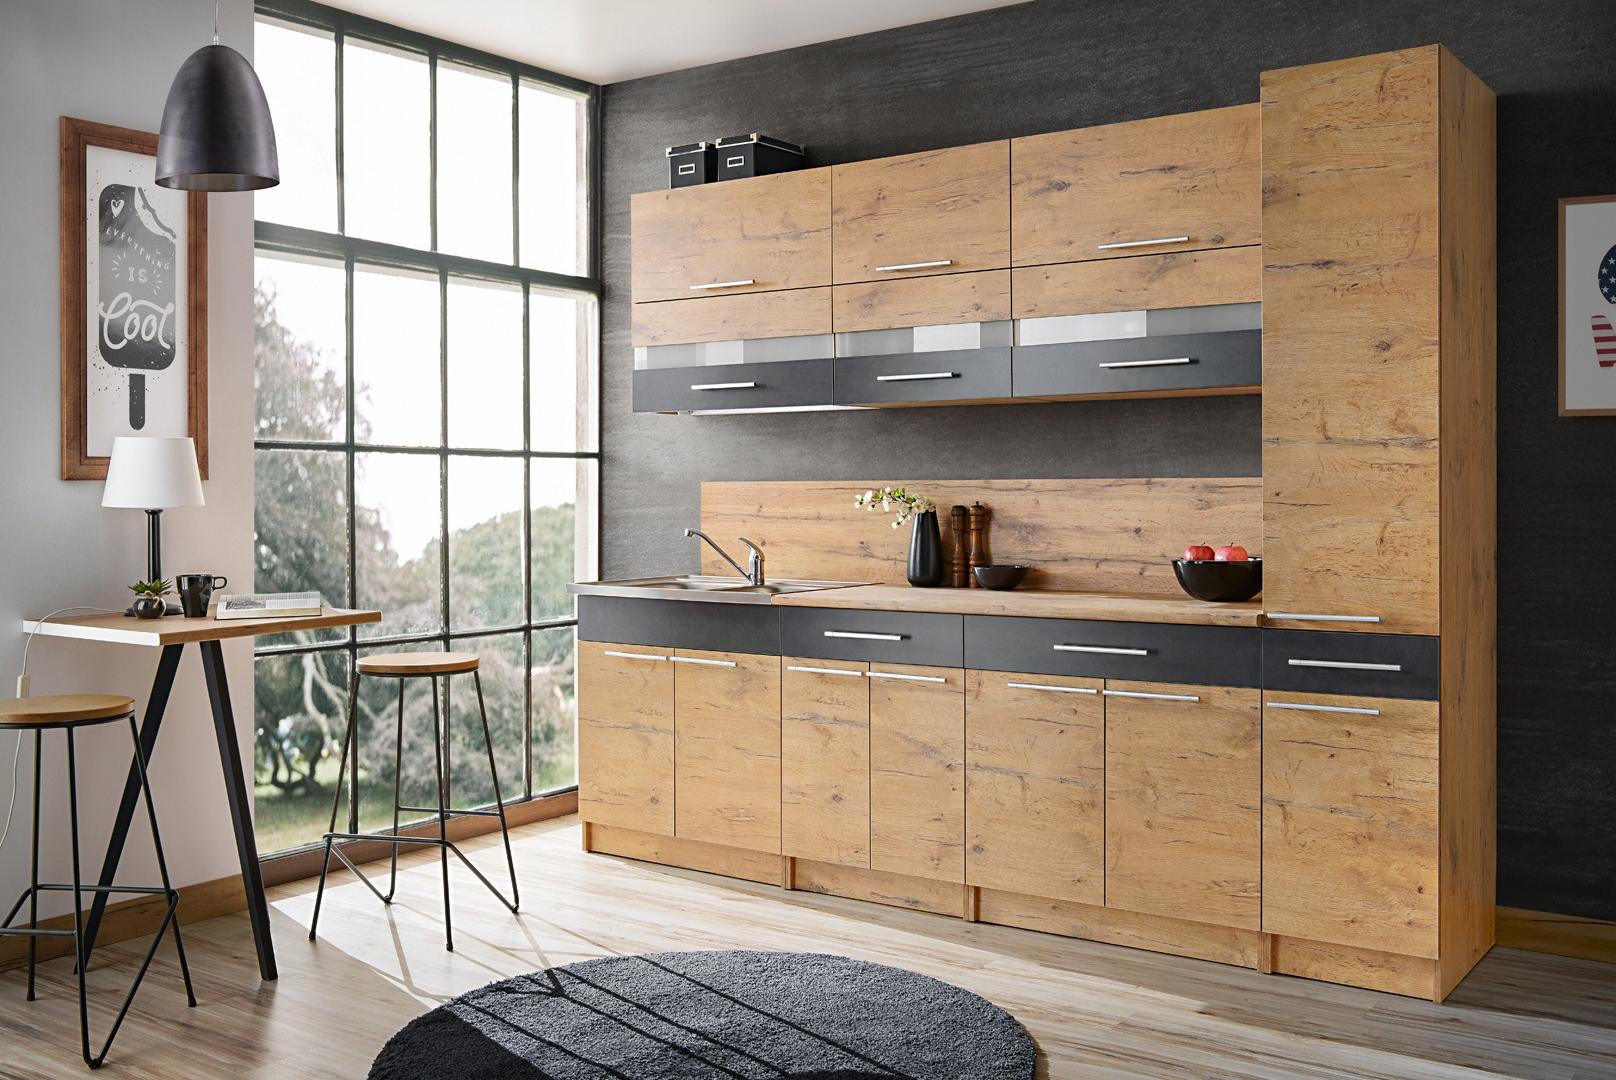 Кухонная мебель EDEK 2 - LANCELOT + BETON